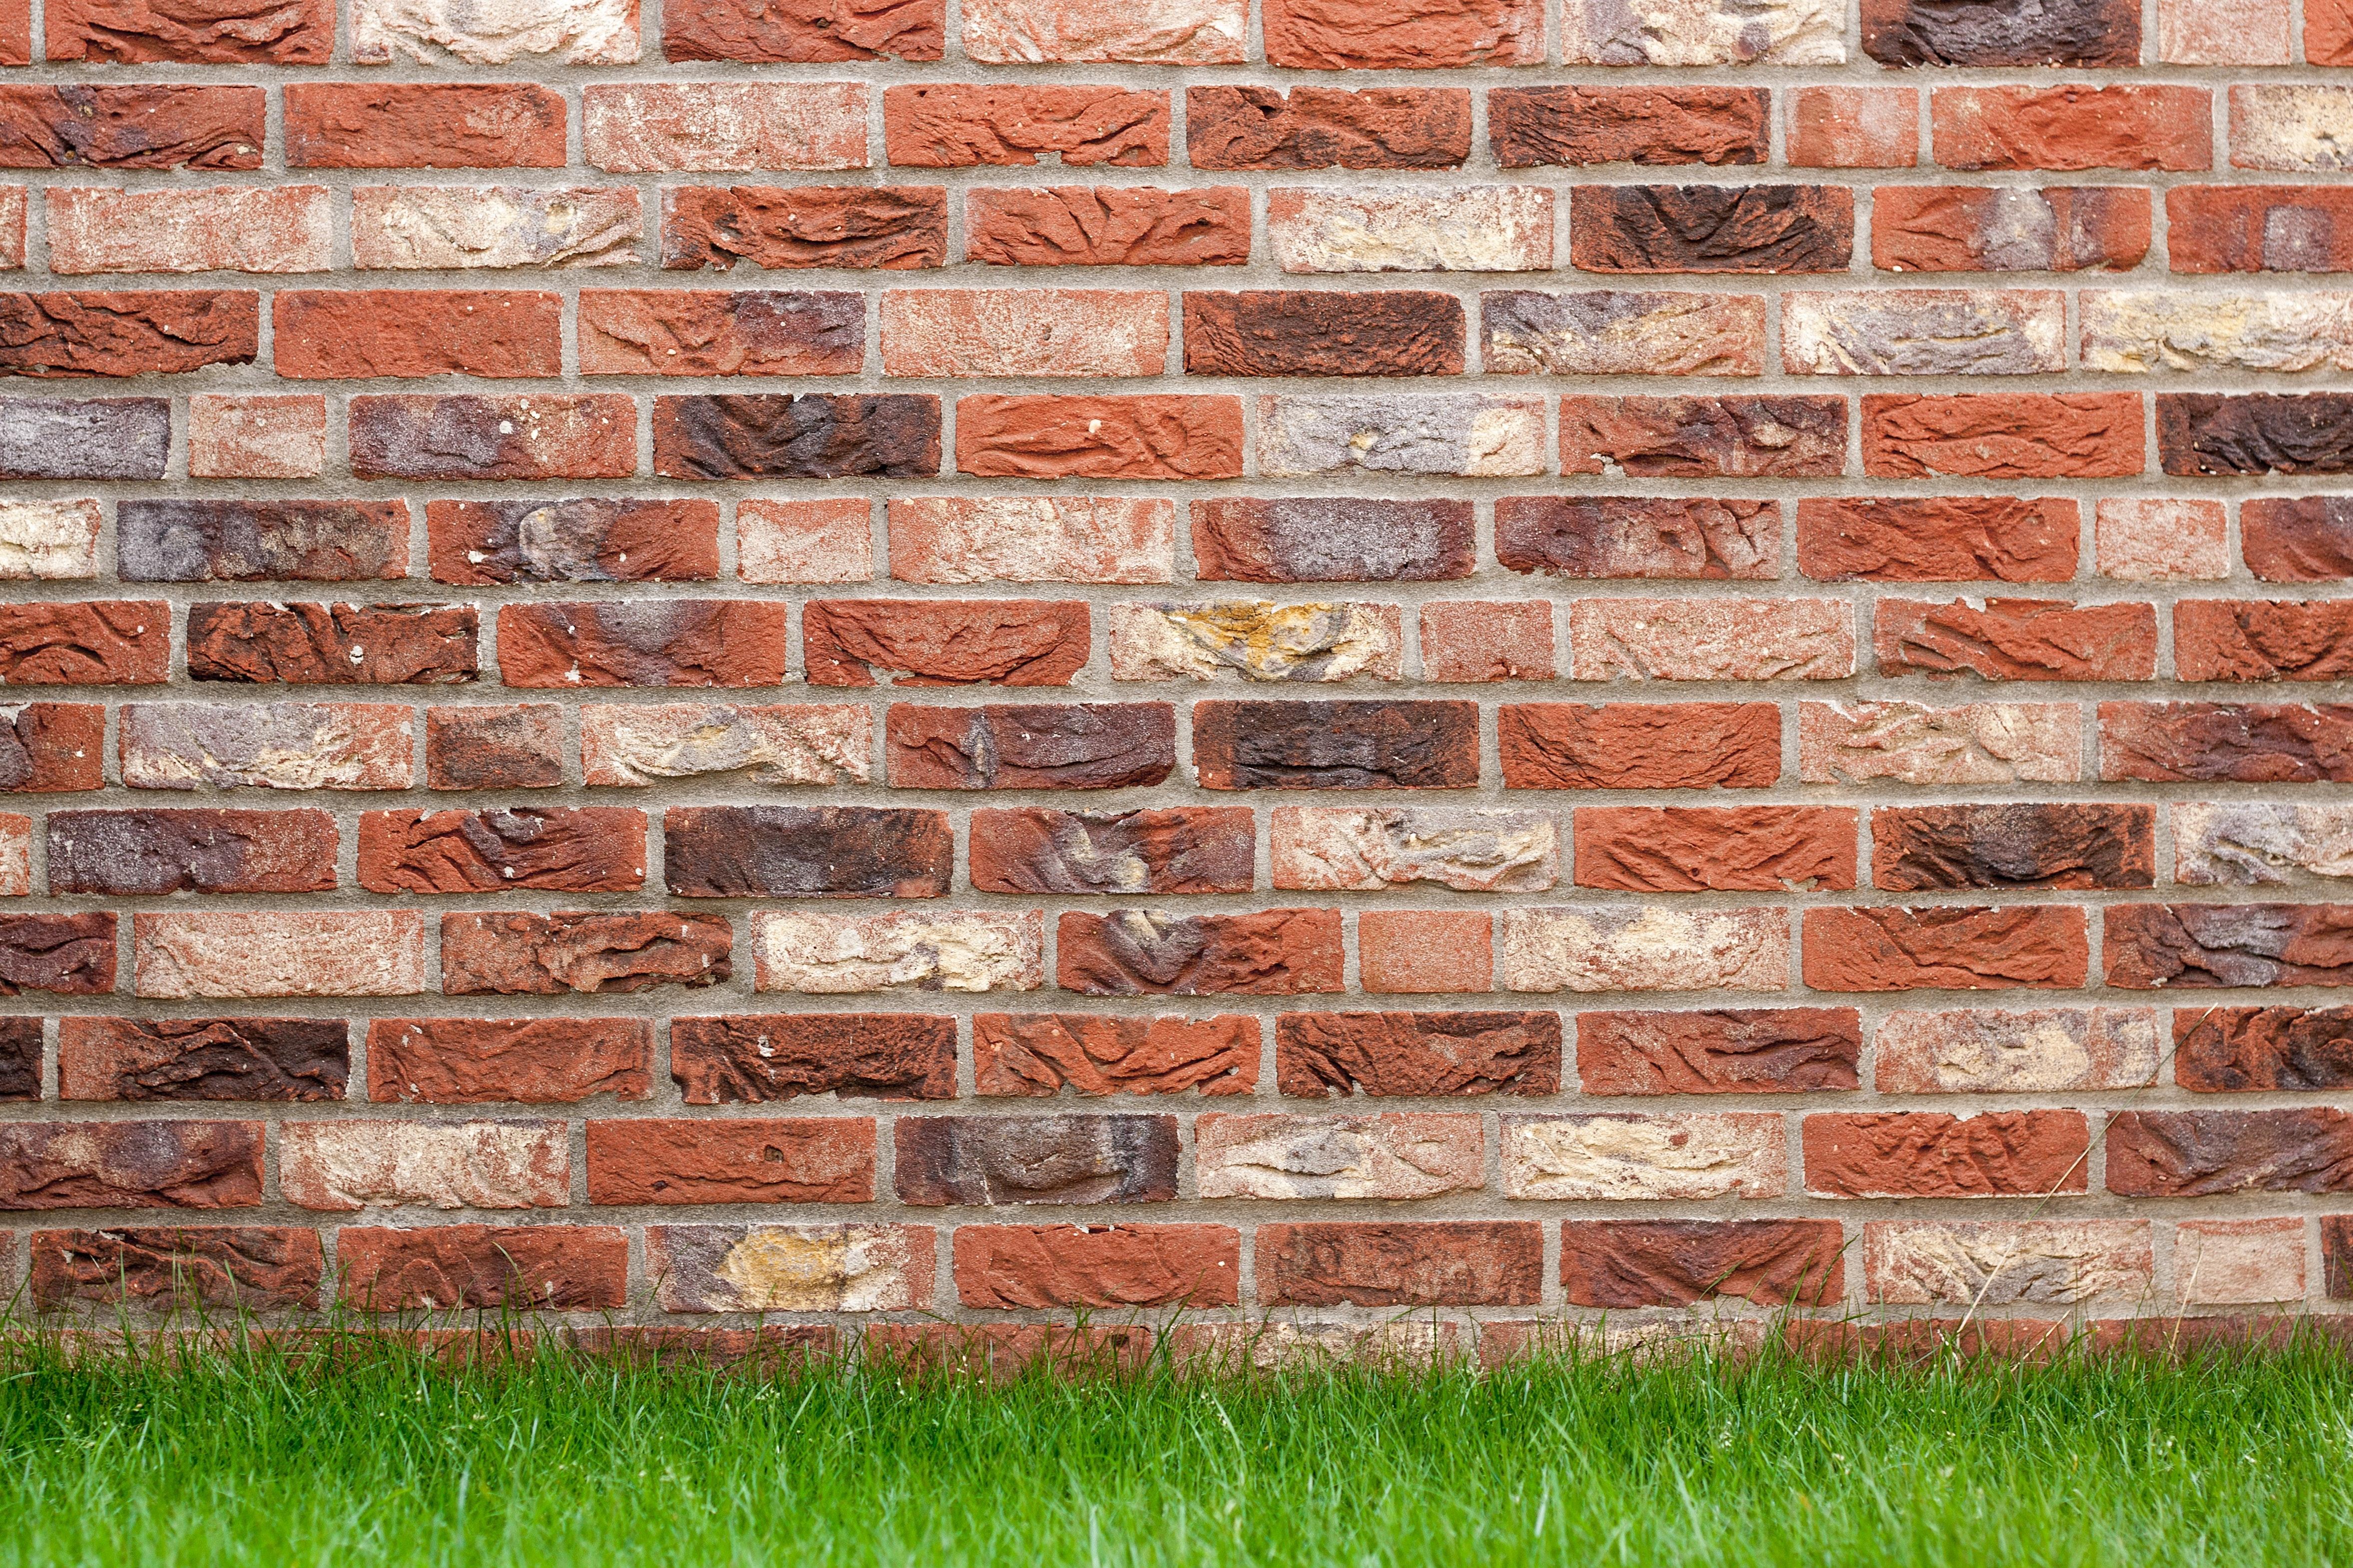 Free stock photo of background brick wall bricks for Pared granate